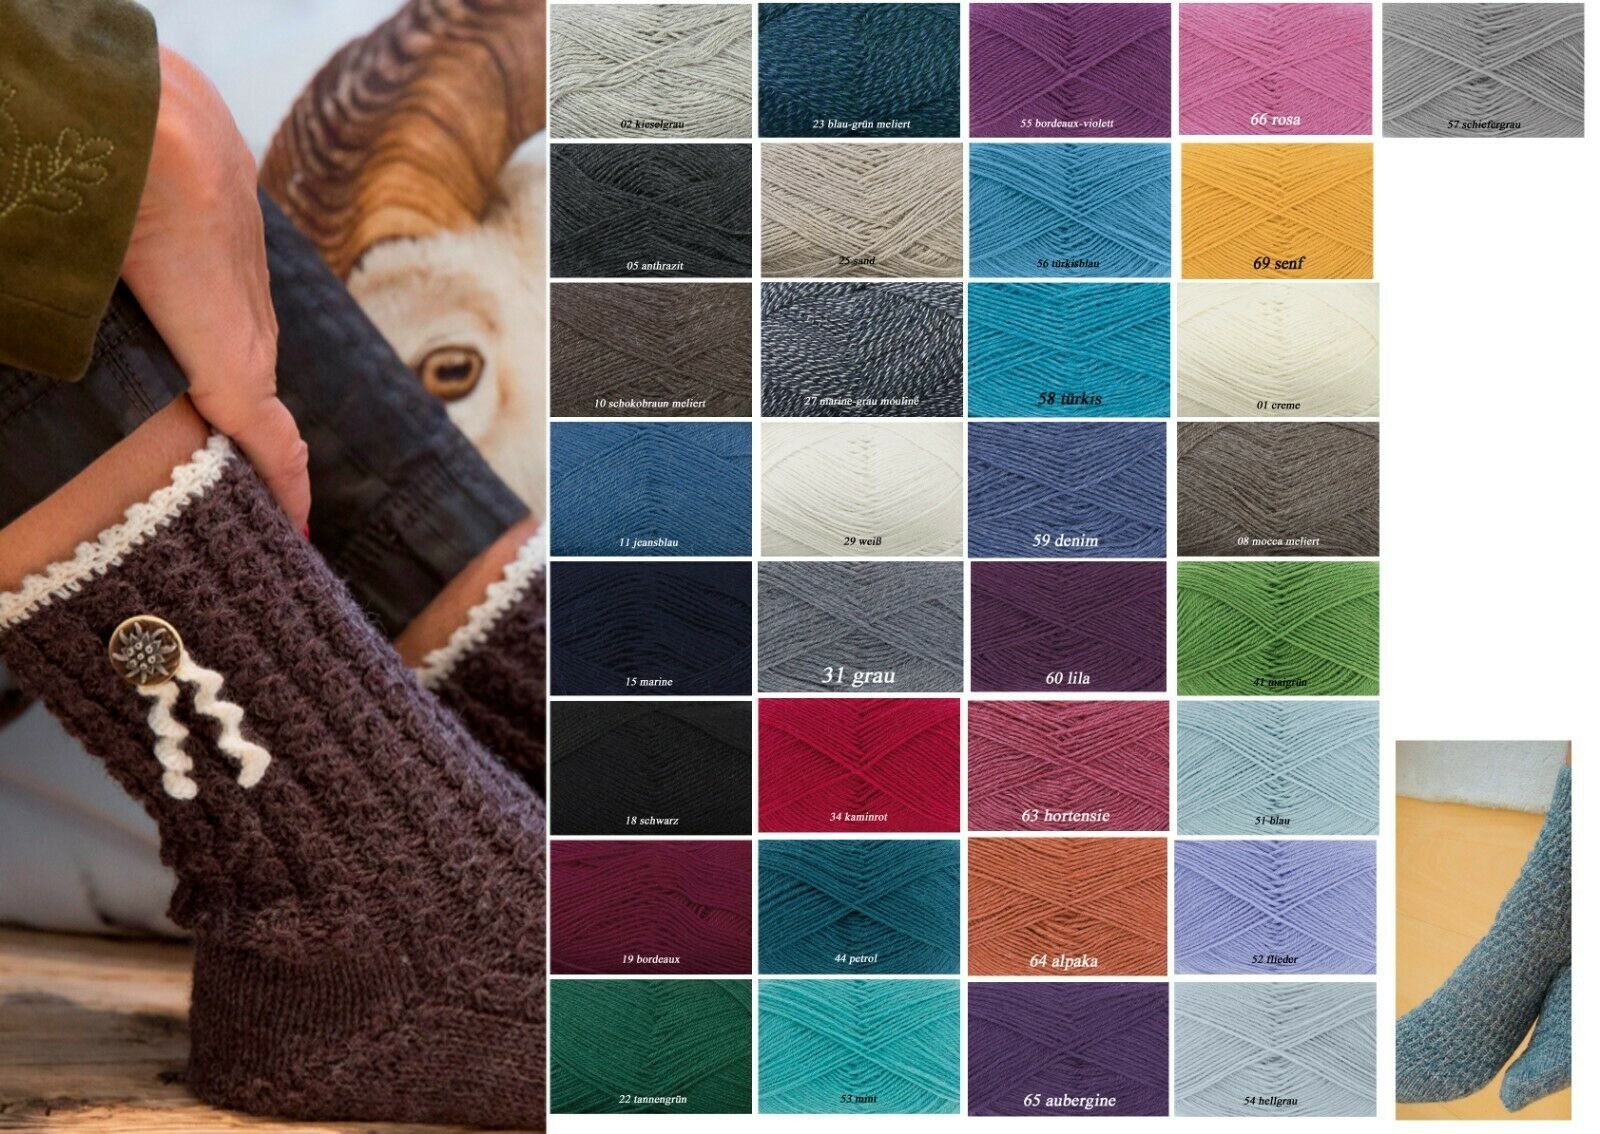 Sockenwolle Strumpfwolle Gründl Hot Socks uni 50, 50g, 4-fädig, viele Farben uni